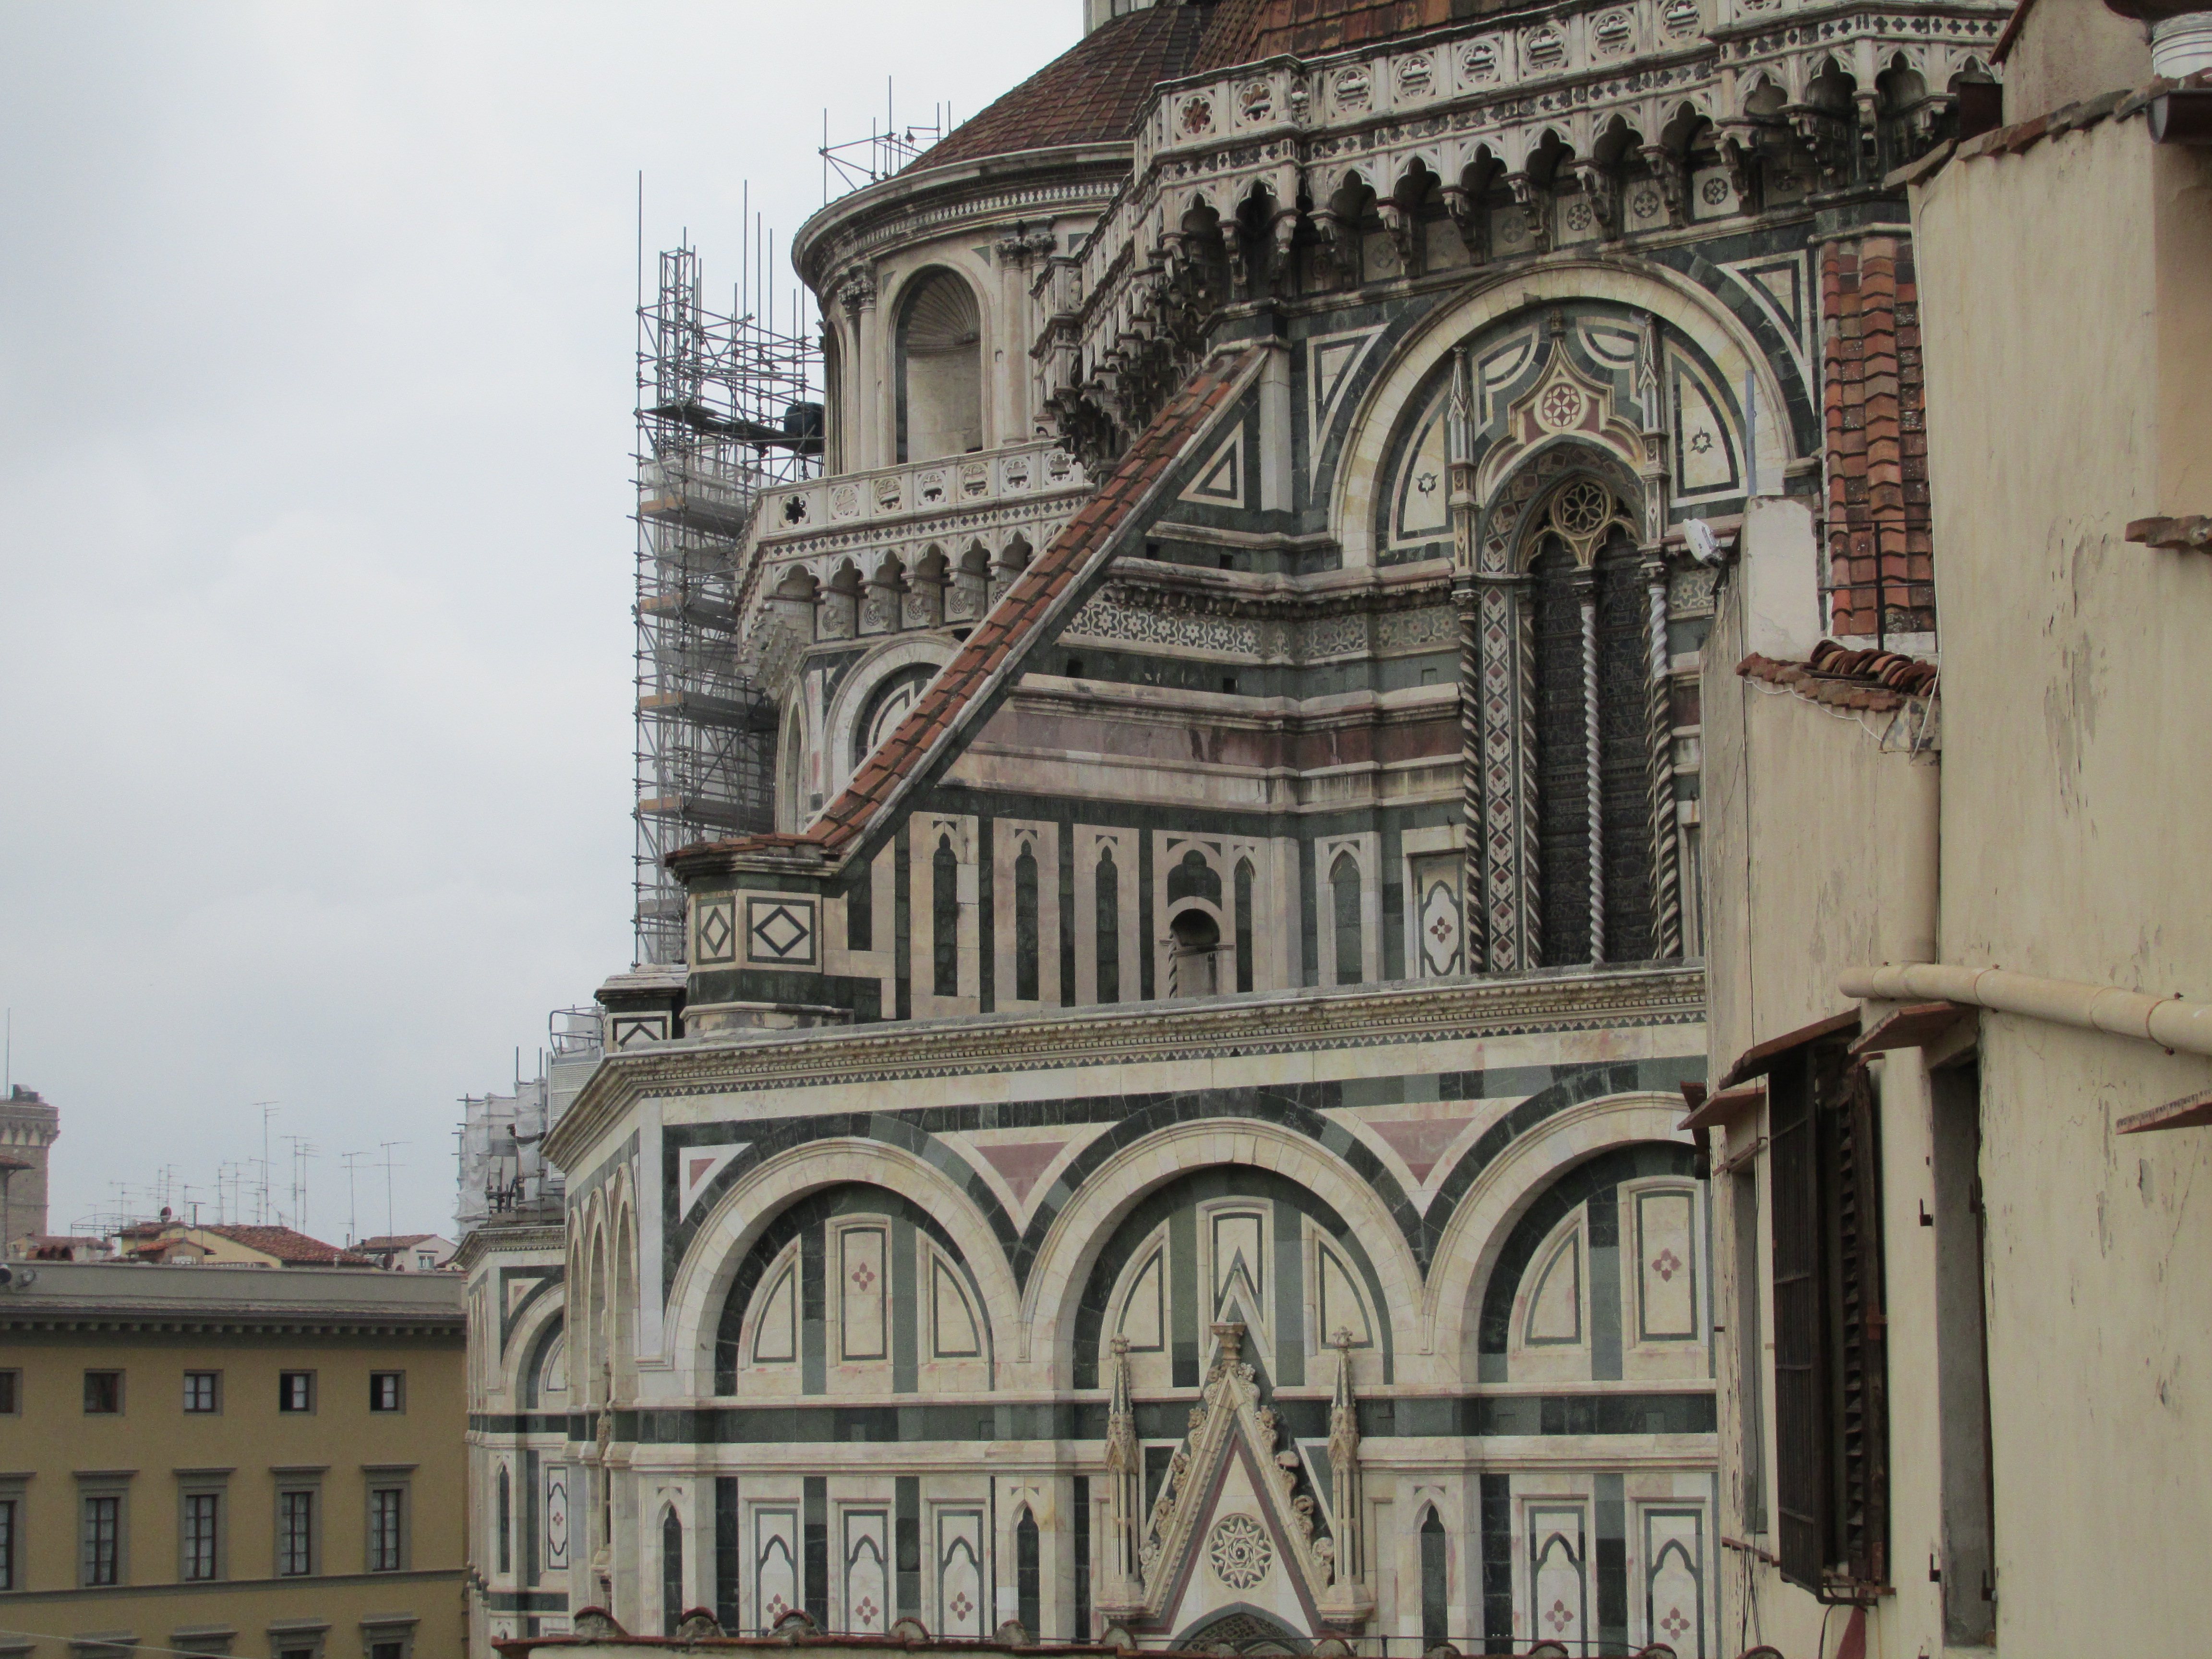 img 2839 - Visitando la Catedral Santa Maria del Fiore de Florencia I/III